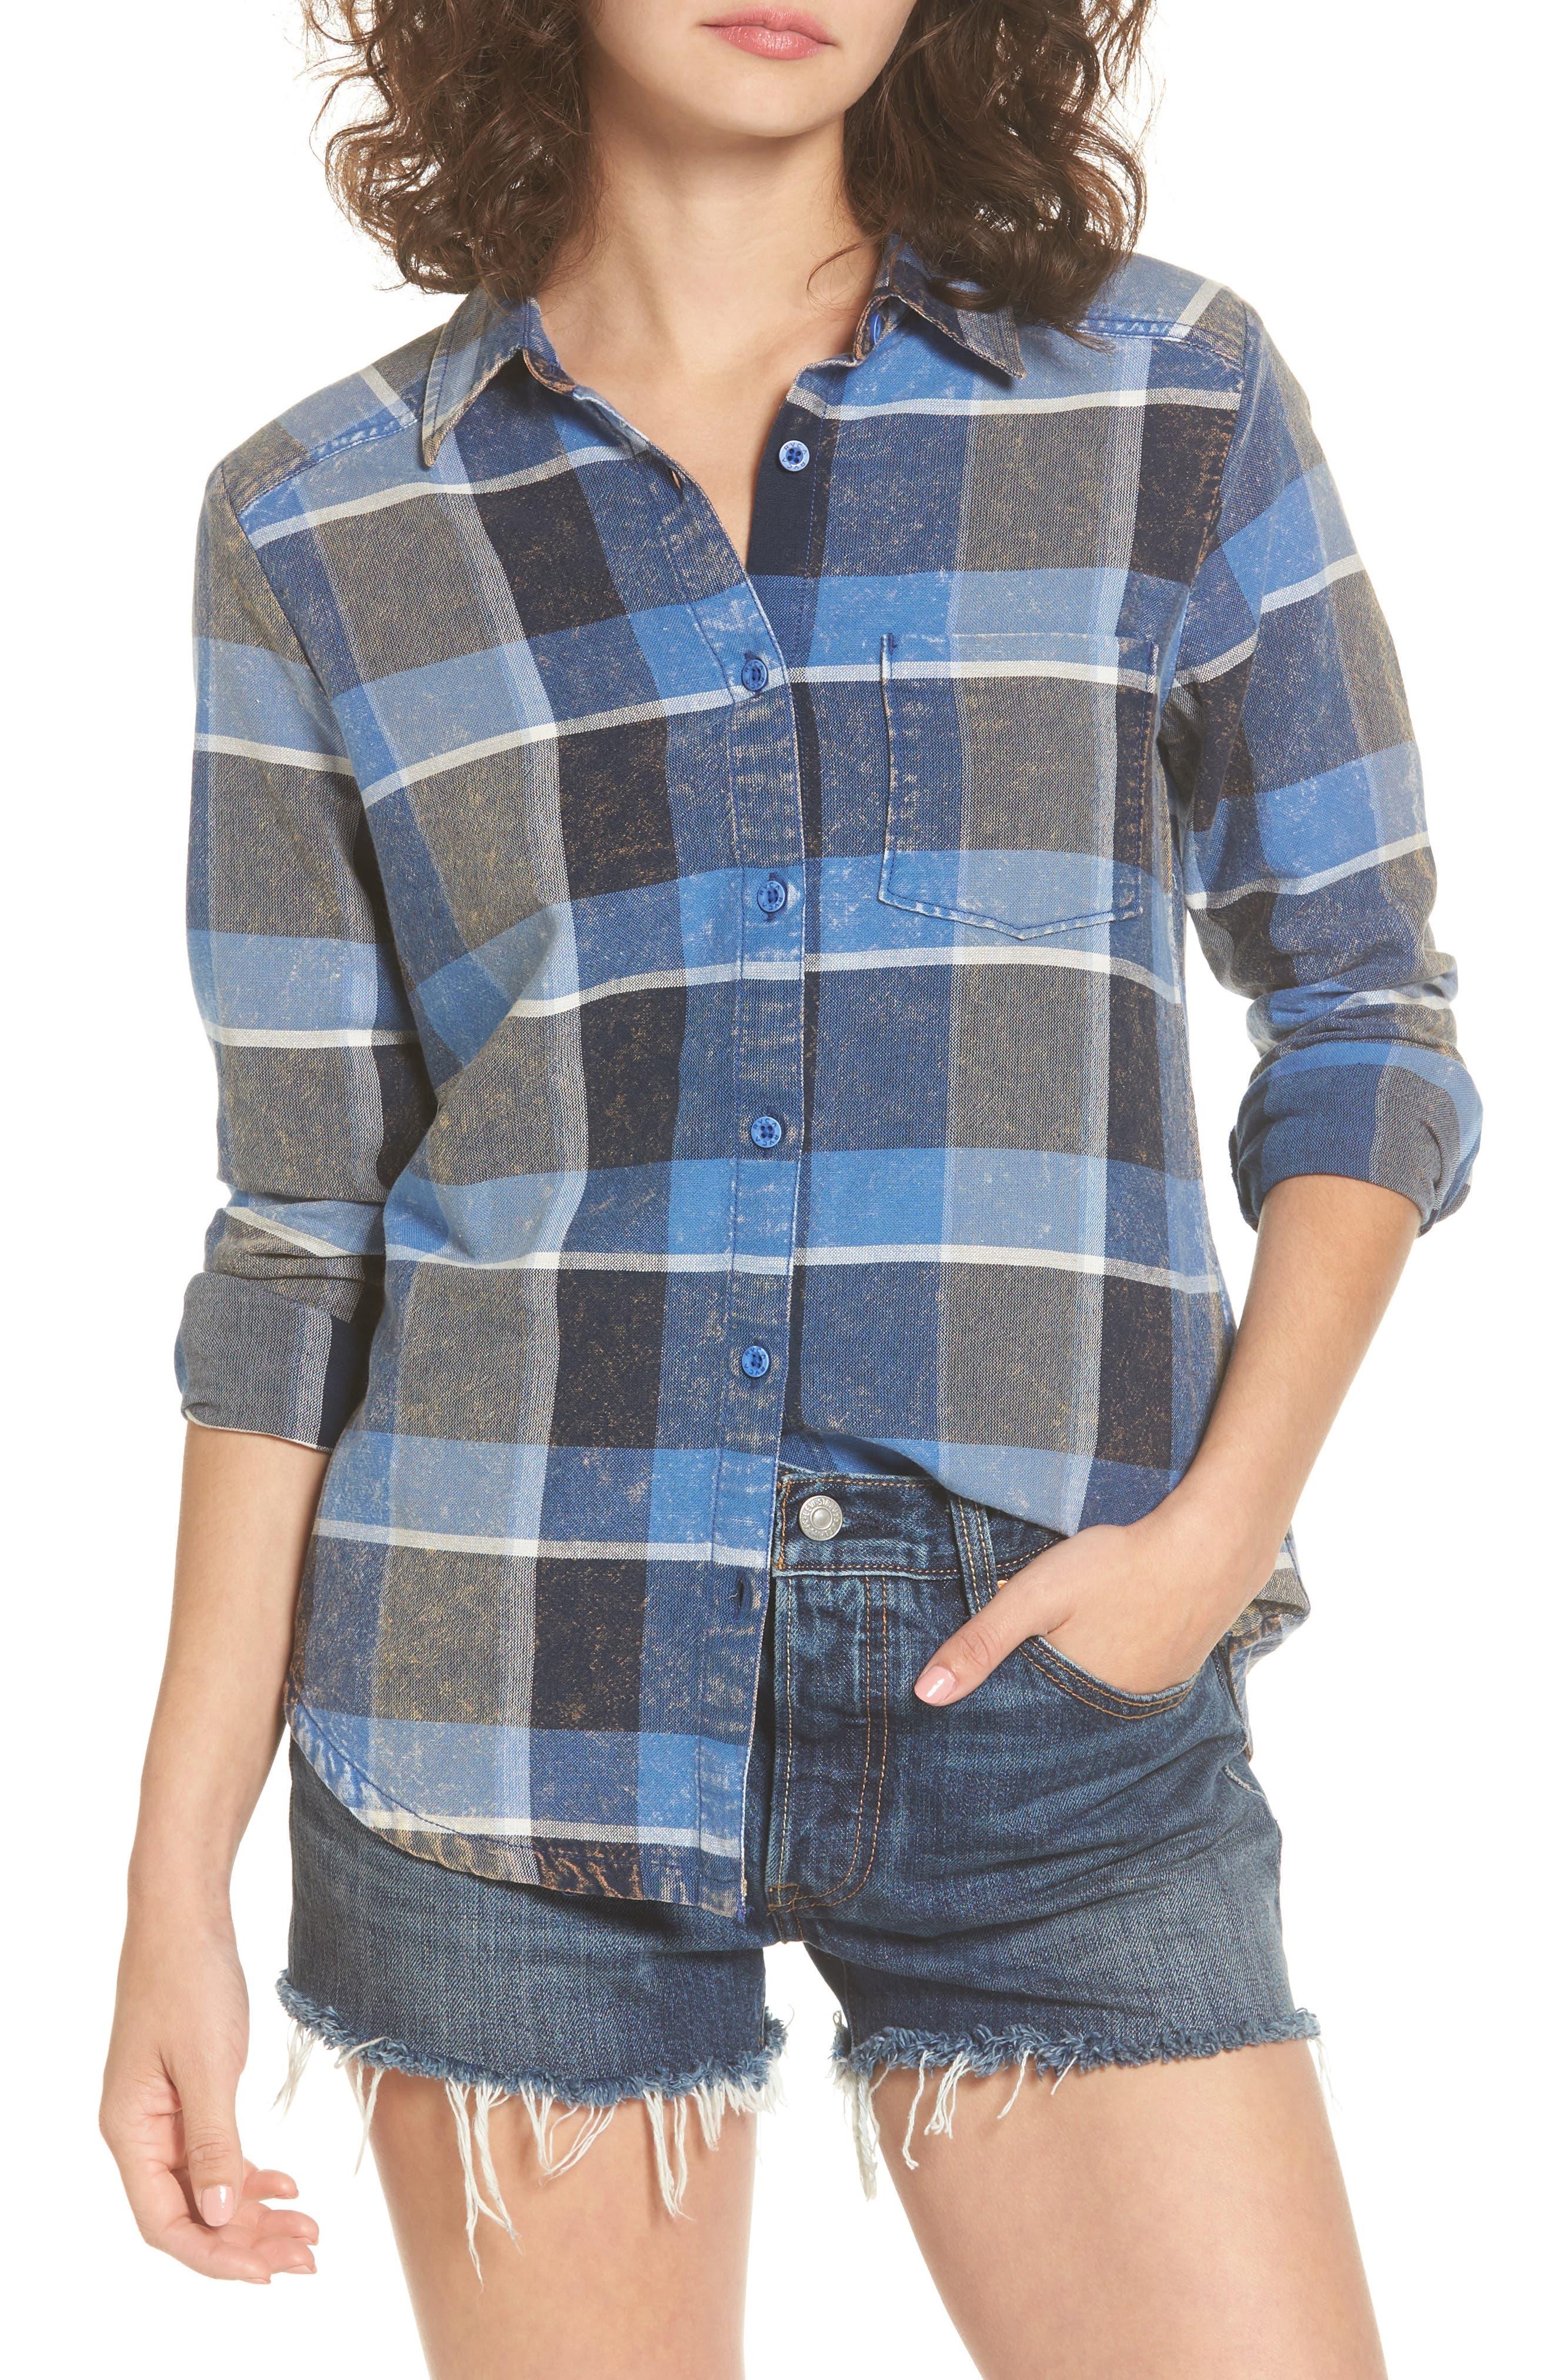 Alternate Image 1 Selected - RVCA Pops Cotton Plaid Shirt